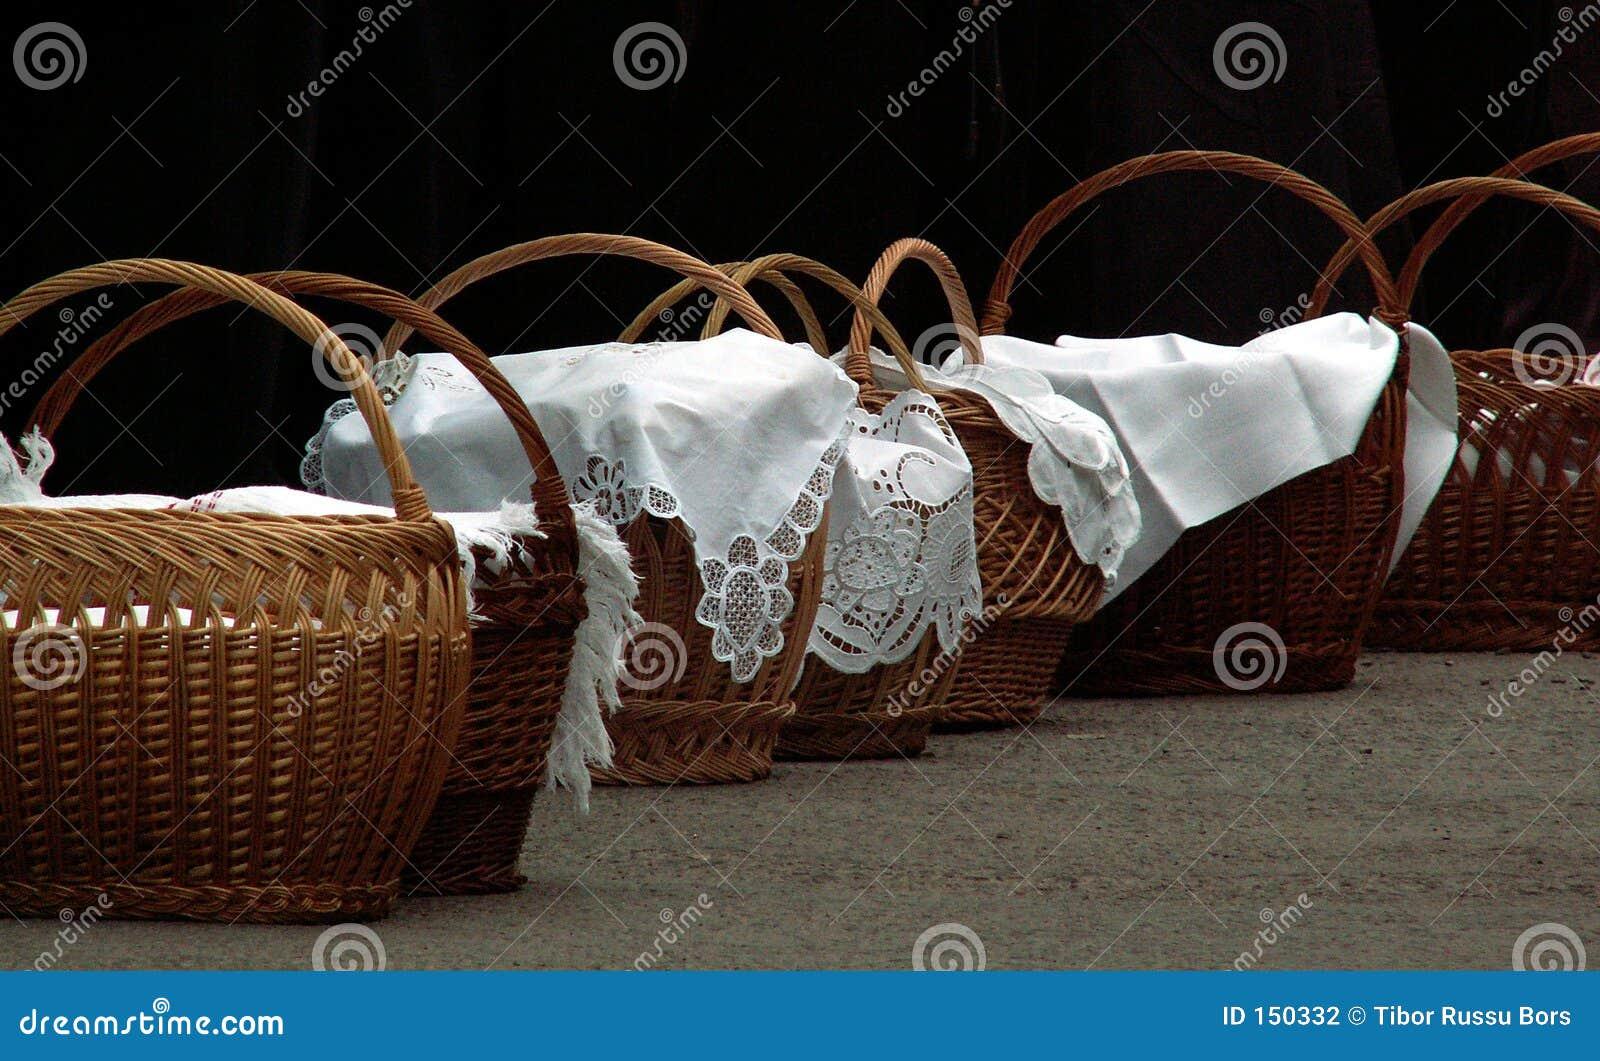 Hallowed meal baskets